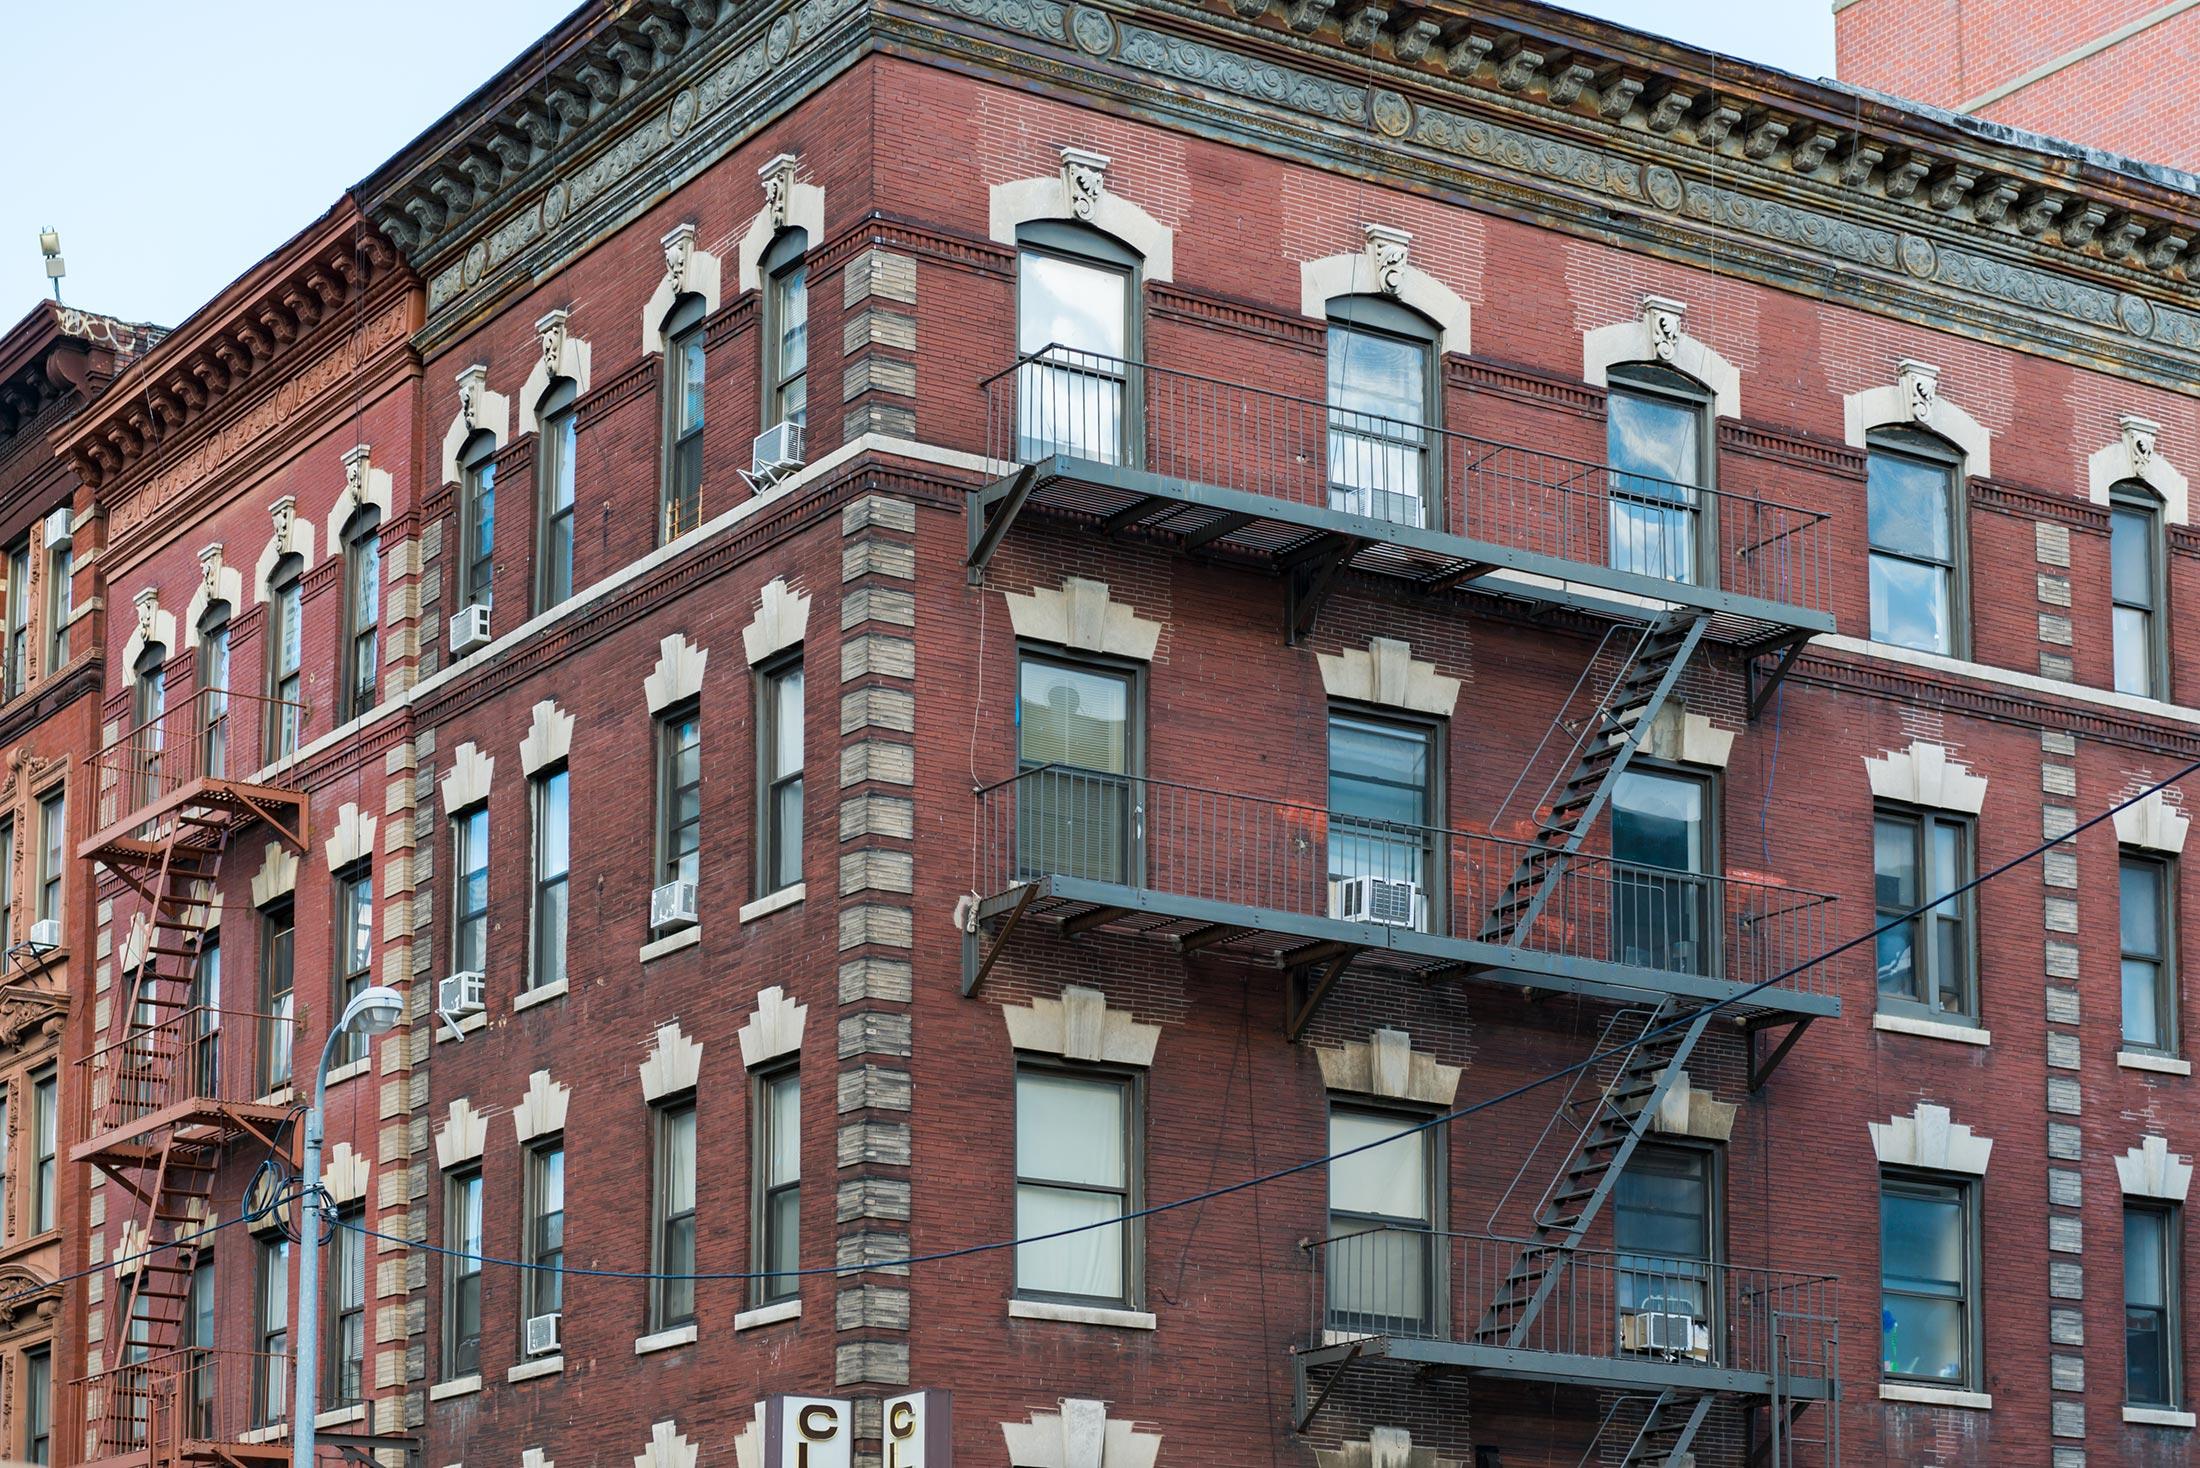 Housing In New York City (Roberto Machado Noa / LightRocket)